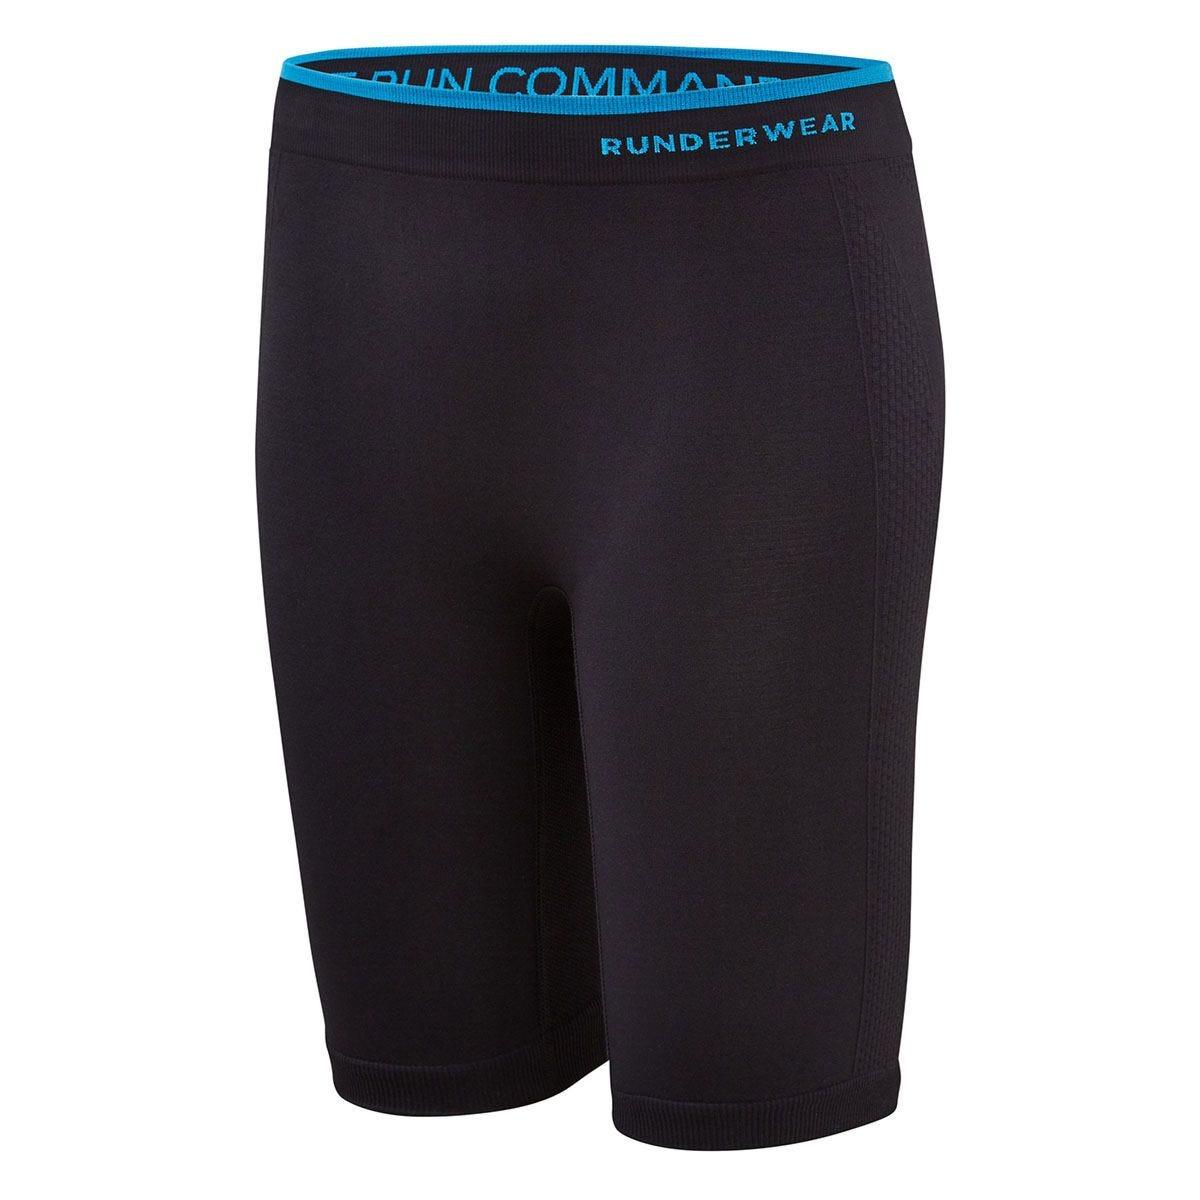 Runderwear Women's Long Shorts - Chafe-Free Small-Black